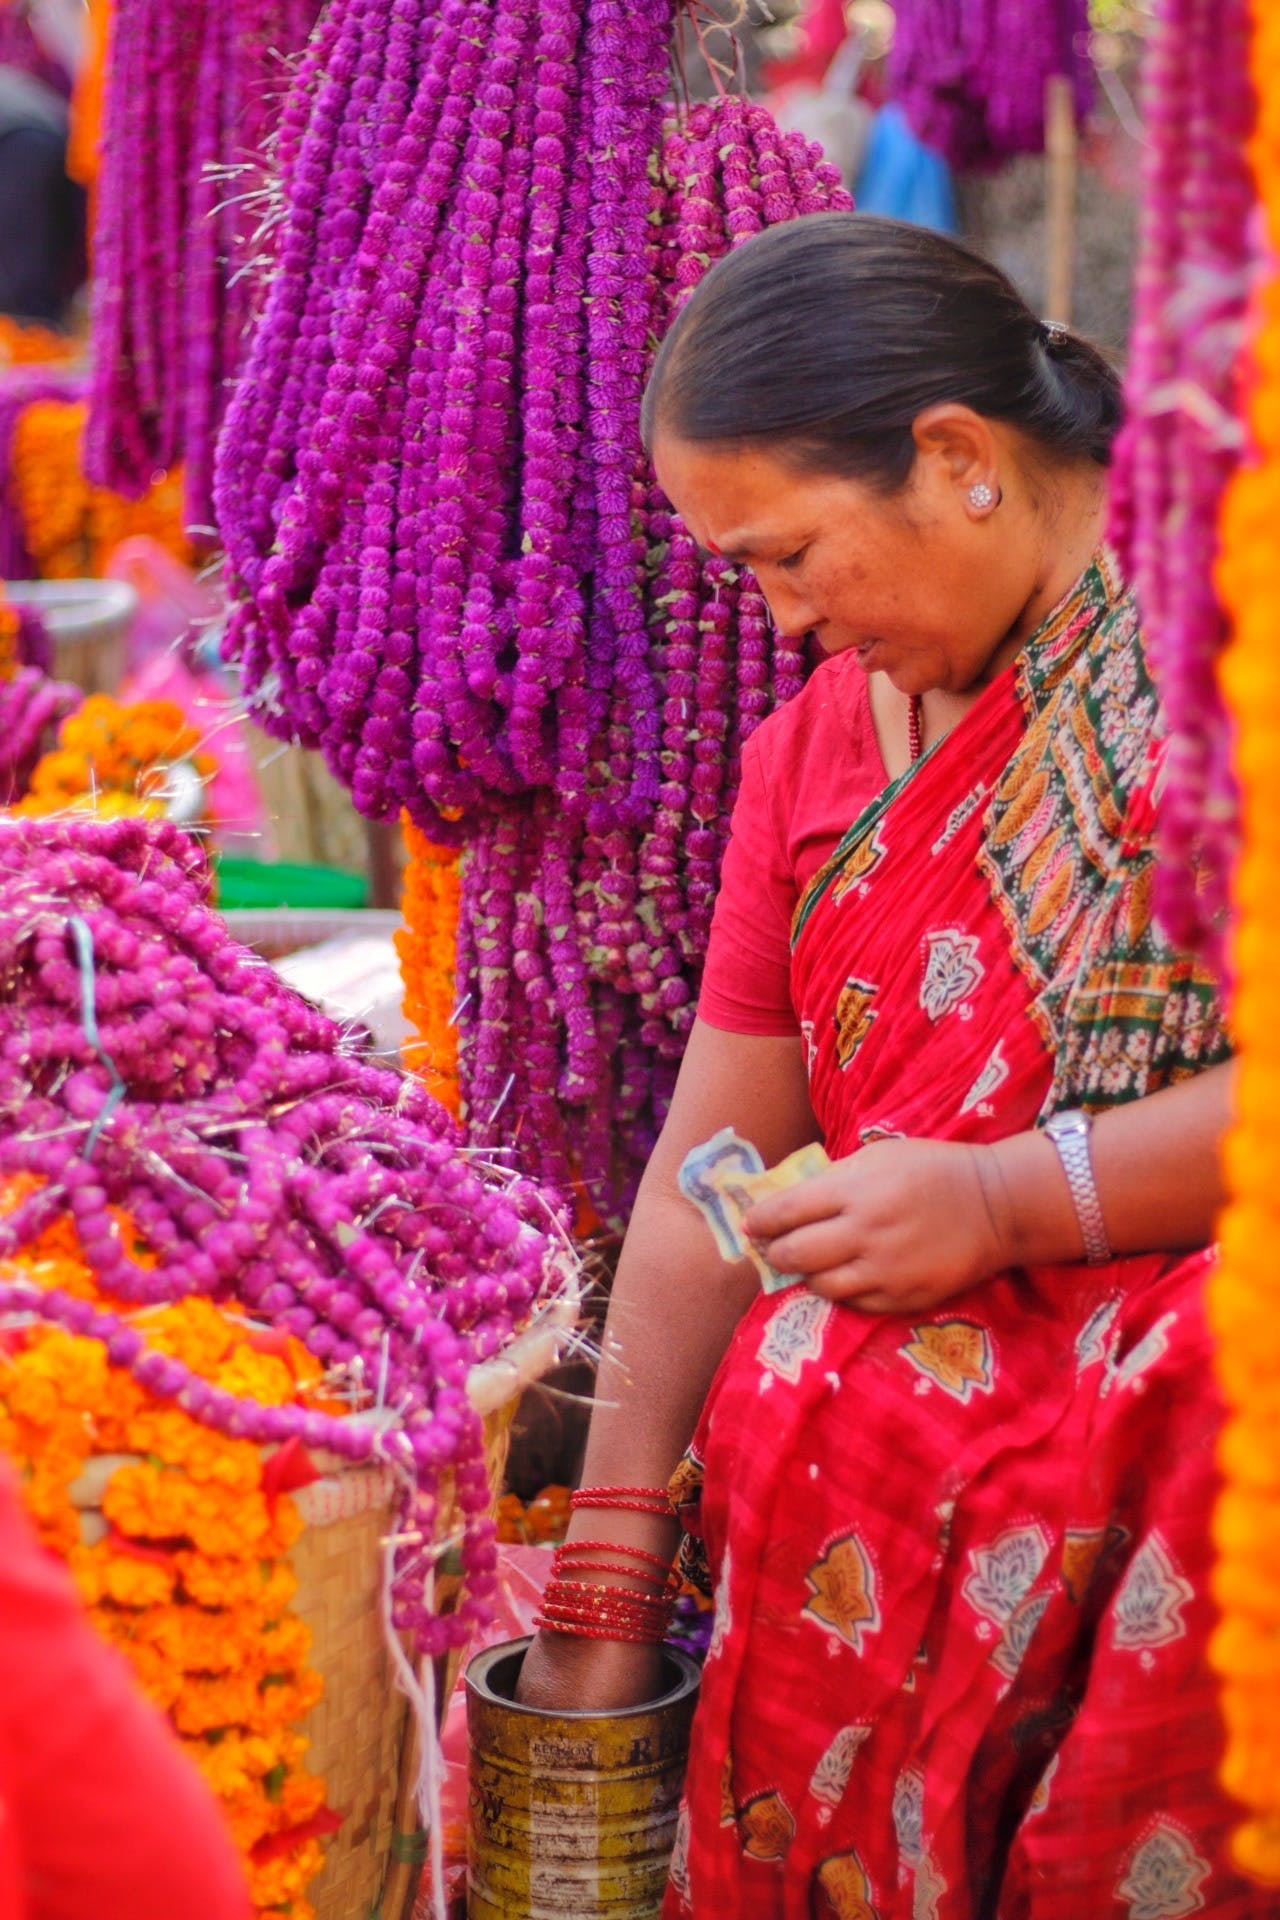 Free stock photo of beautiful flowers, culture, happiness, merchants